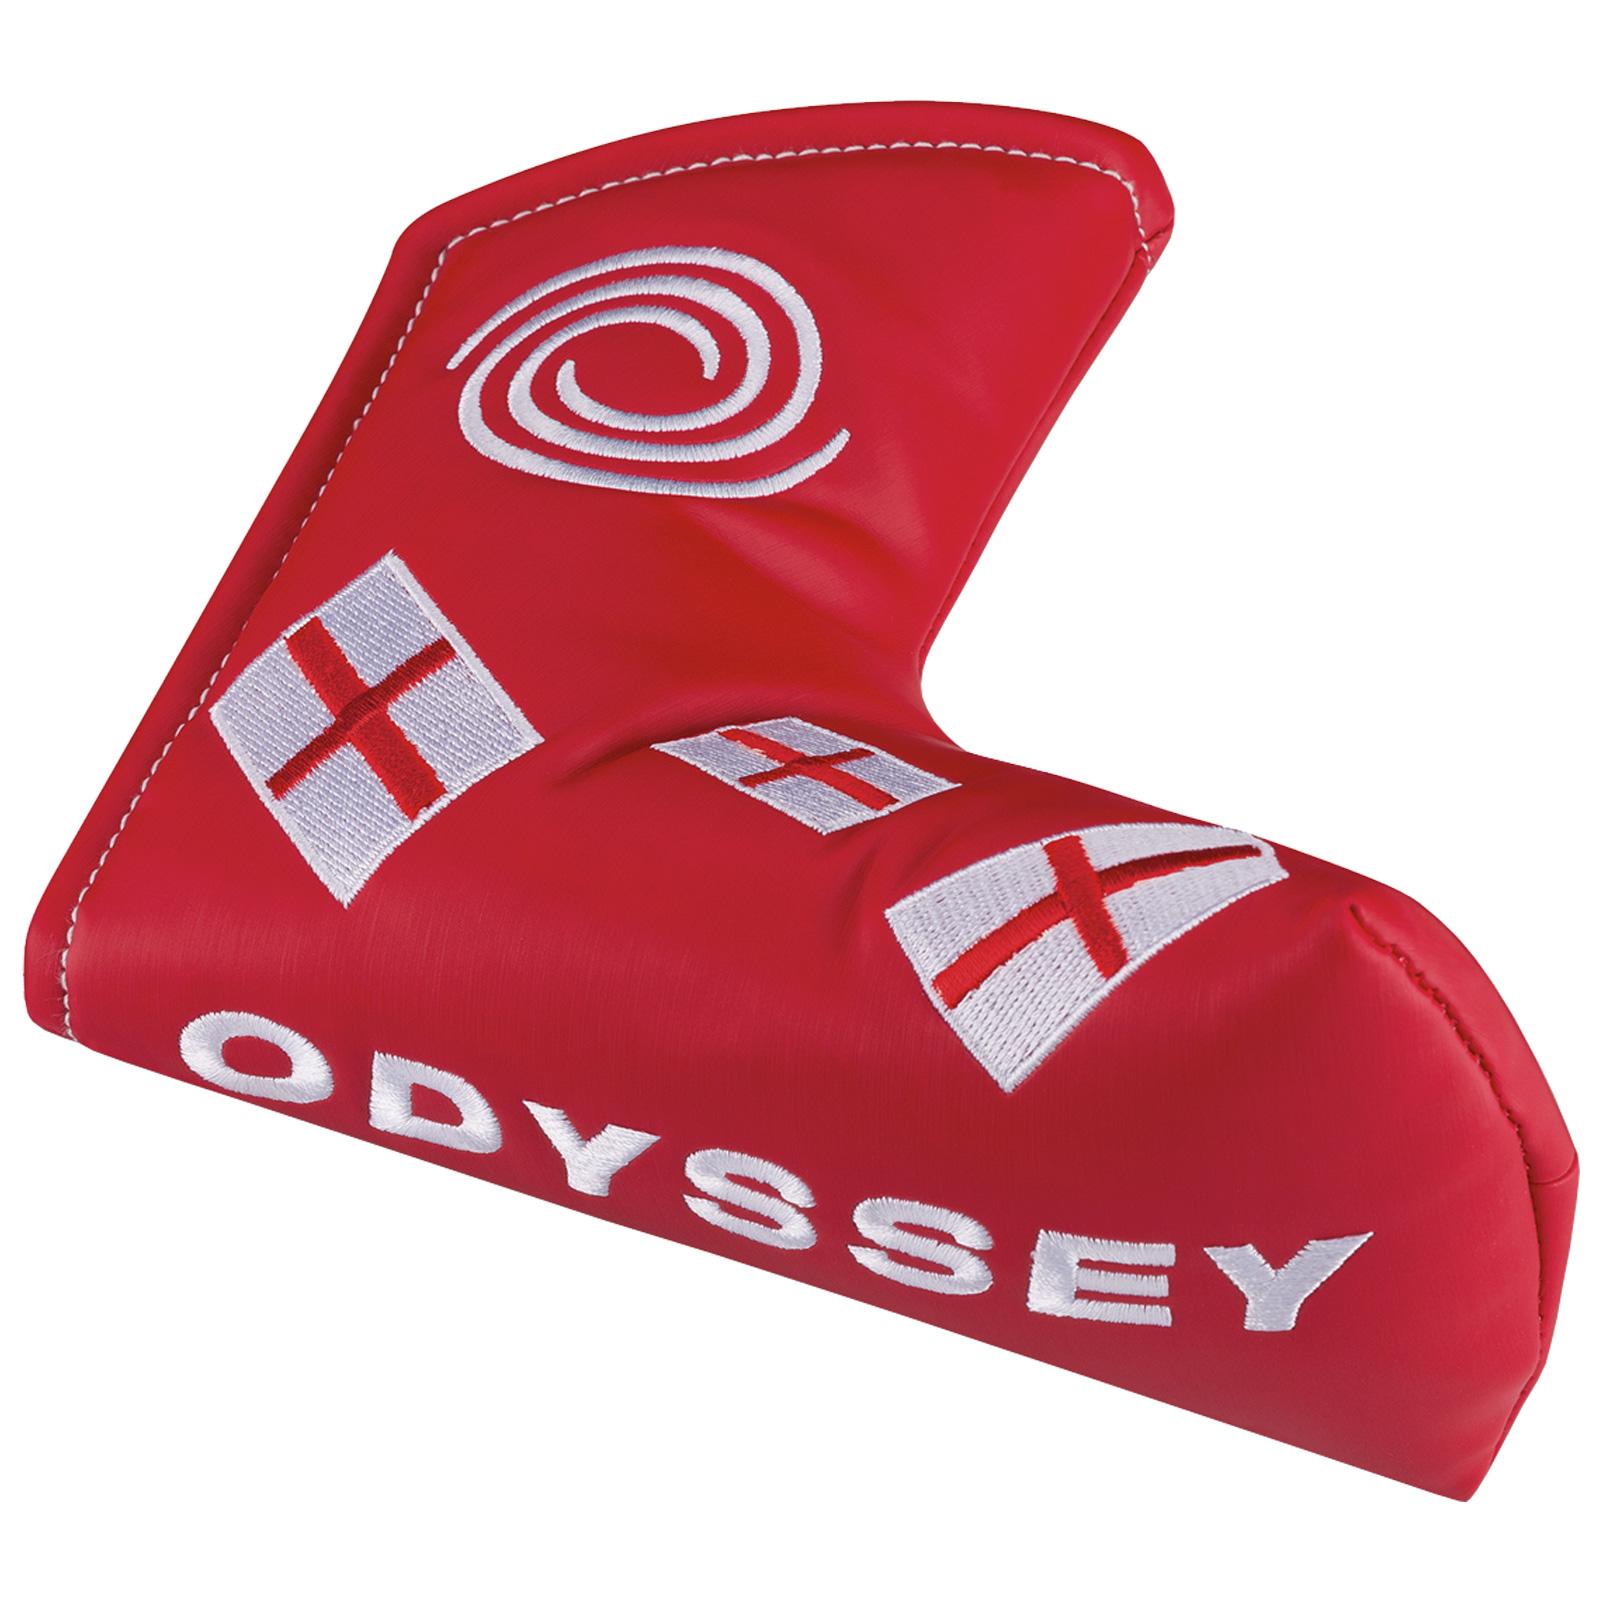 Indexbild 7 - Odyssey Golf Putter Headcovers - Mallet Blade Swirl Novelty Universal Cover